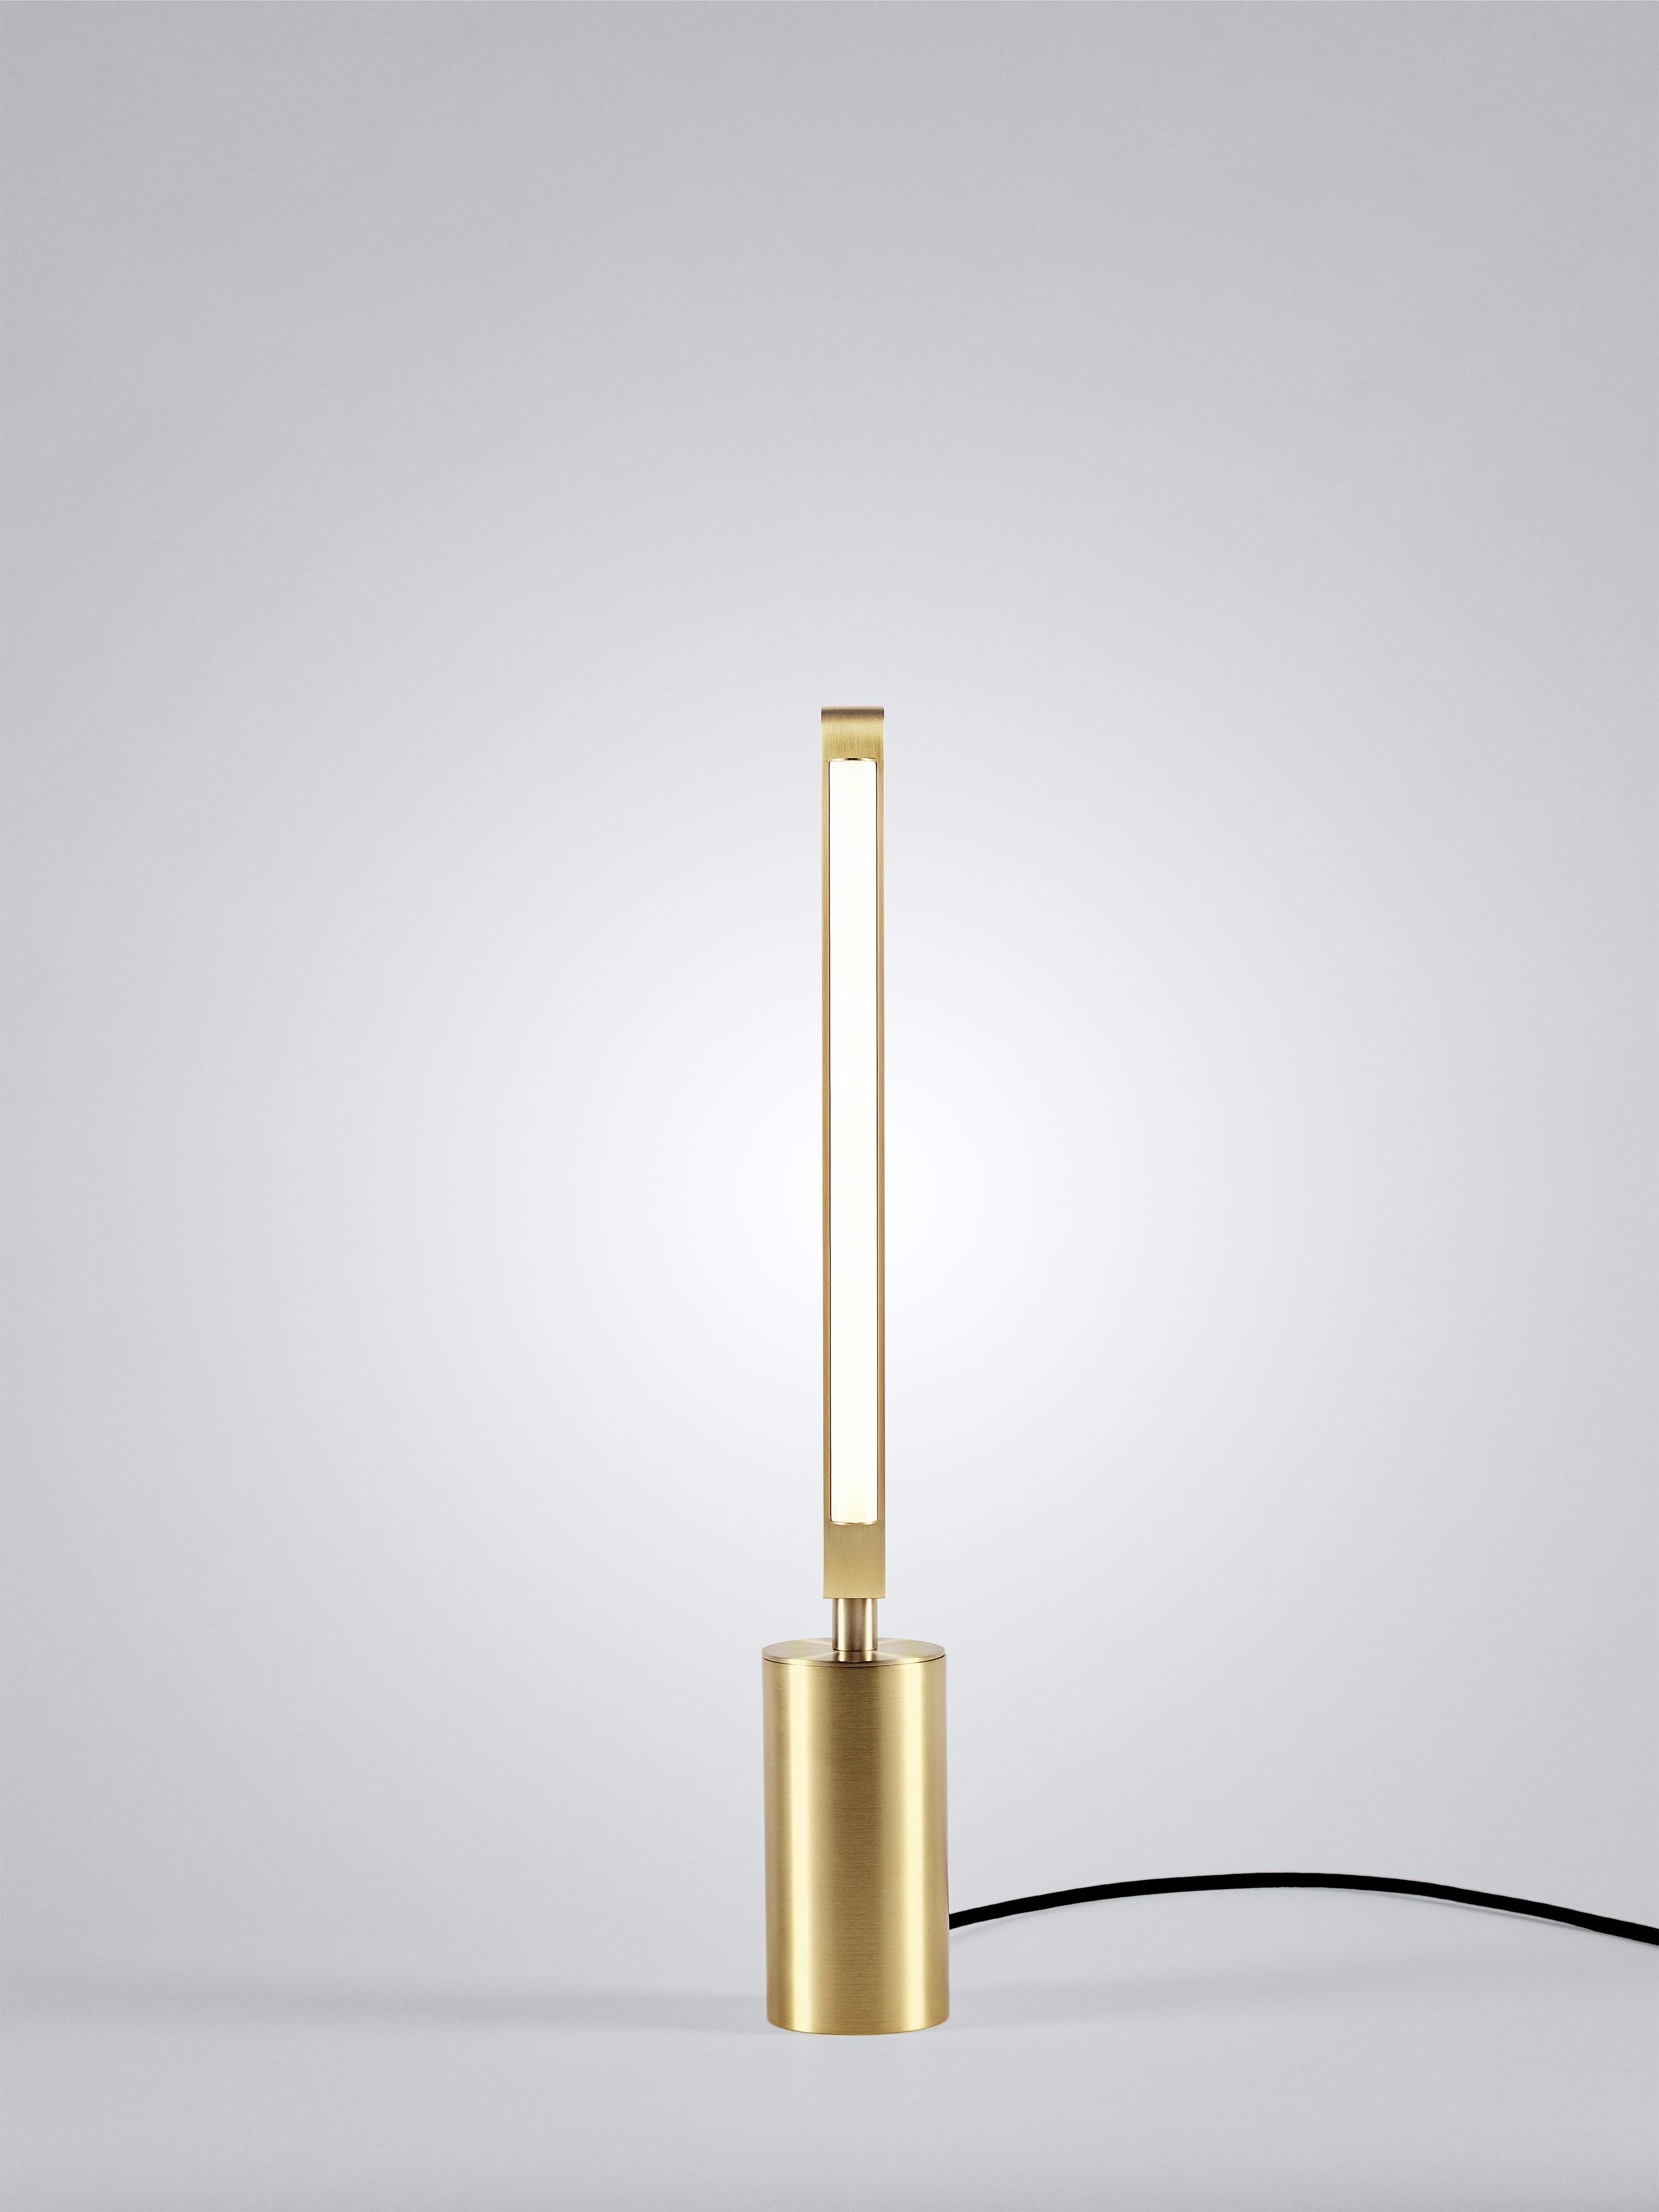 01 Pris Table Lamp Satin Brass